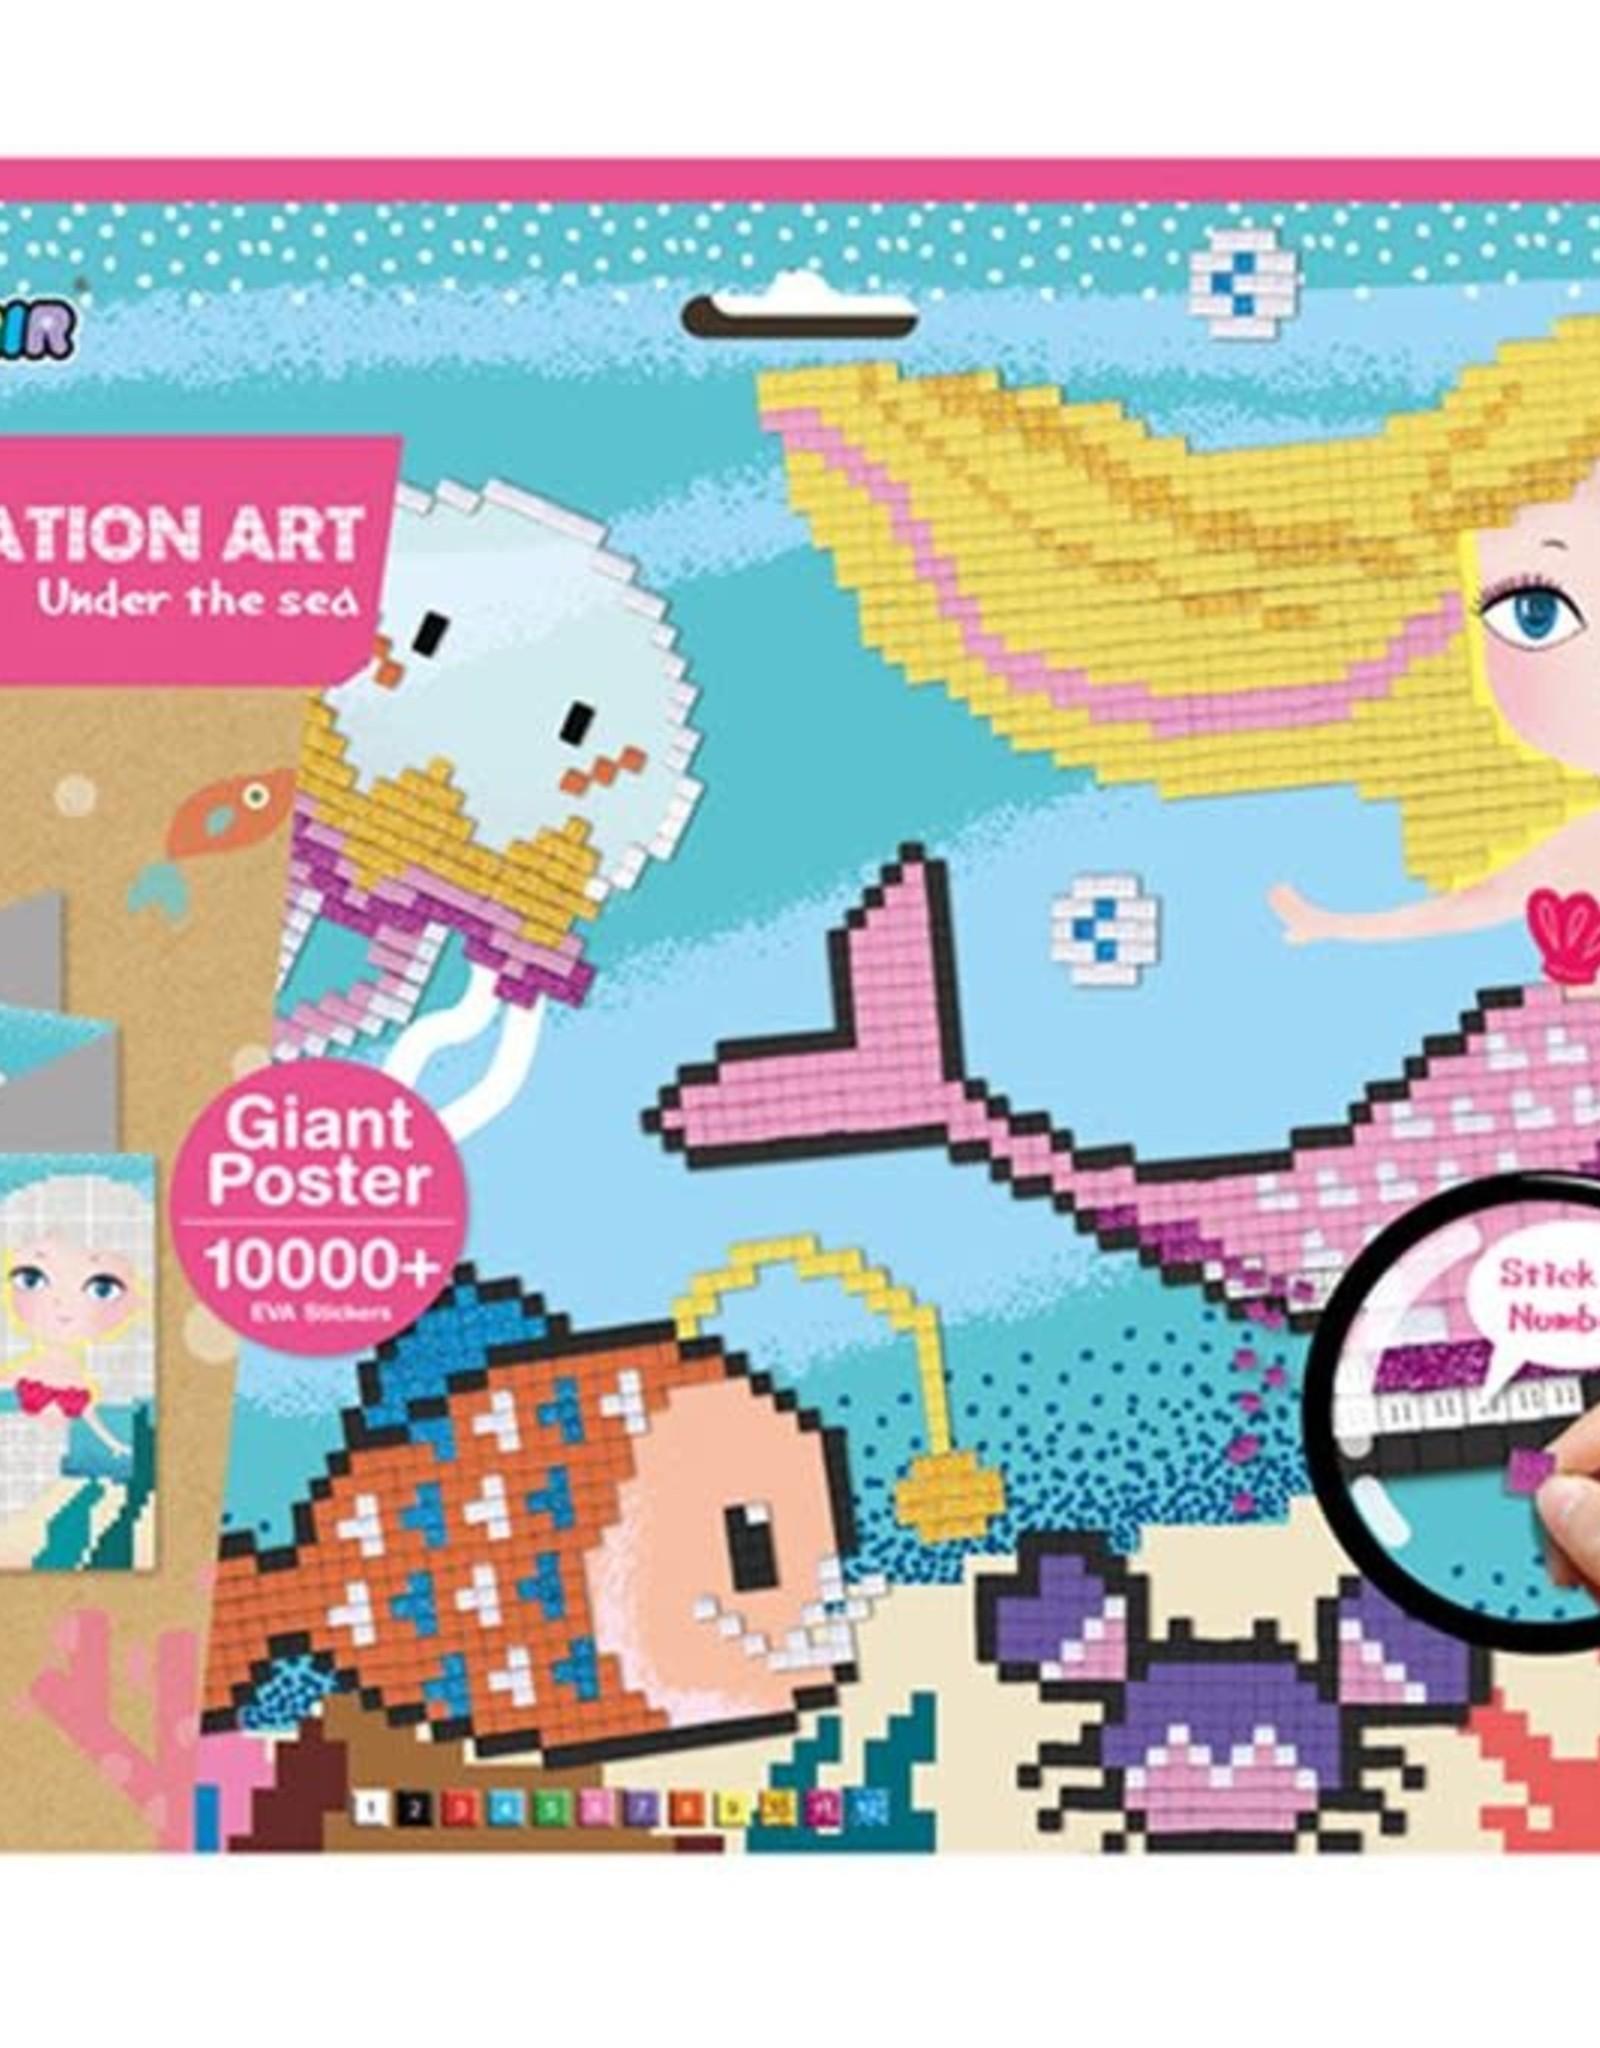 Avenir Pixelation Art Under the sea